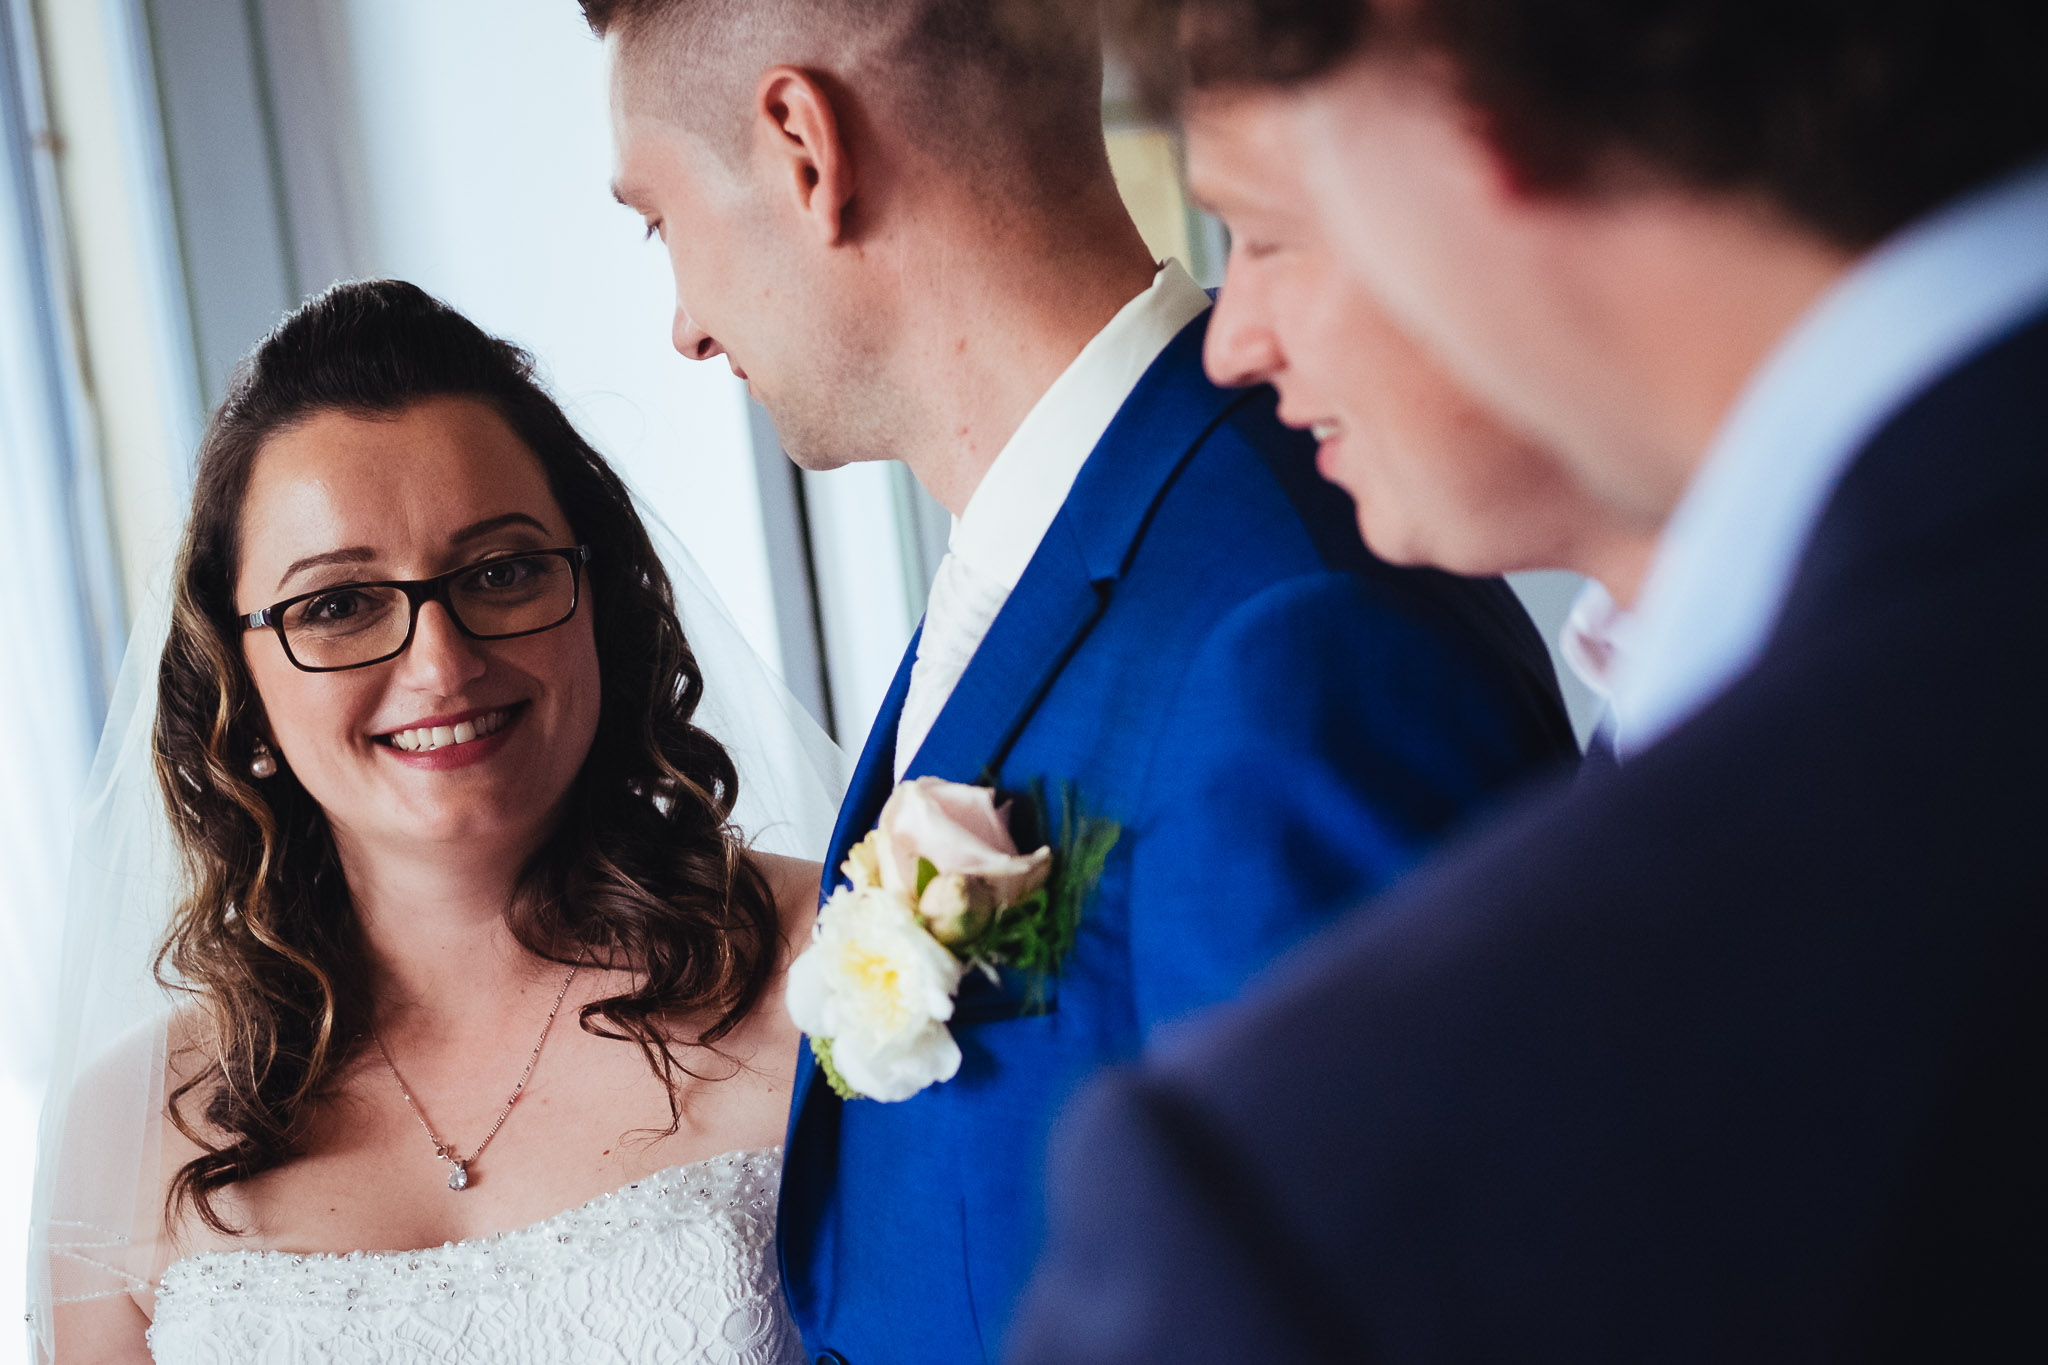 bruiloft op landgoed westerlee in groningen met dilek en tim groepsportret